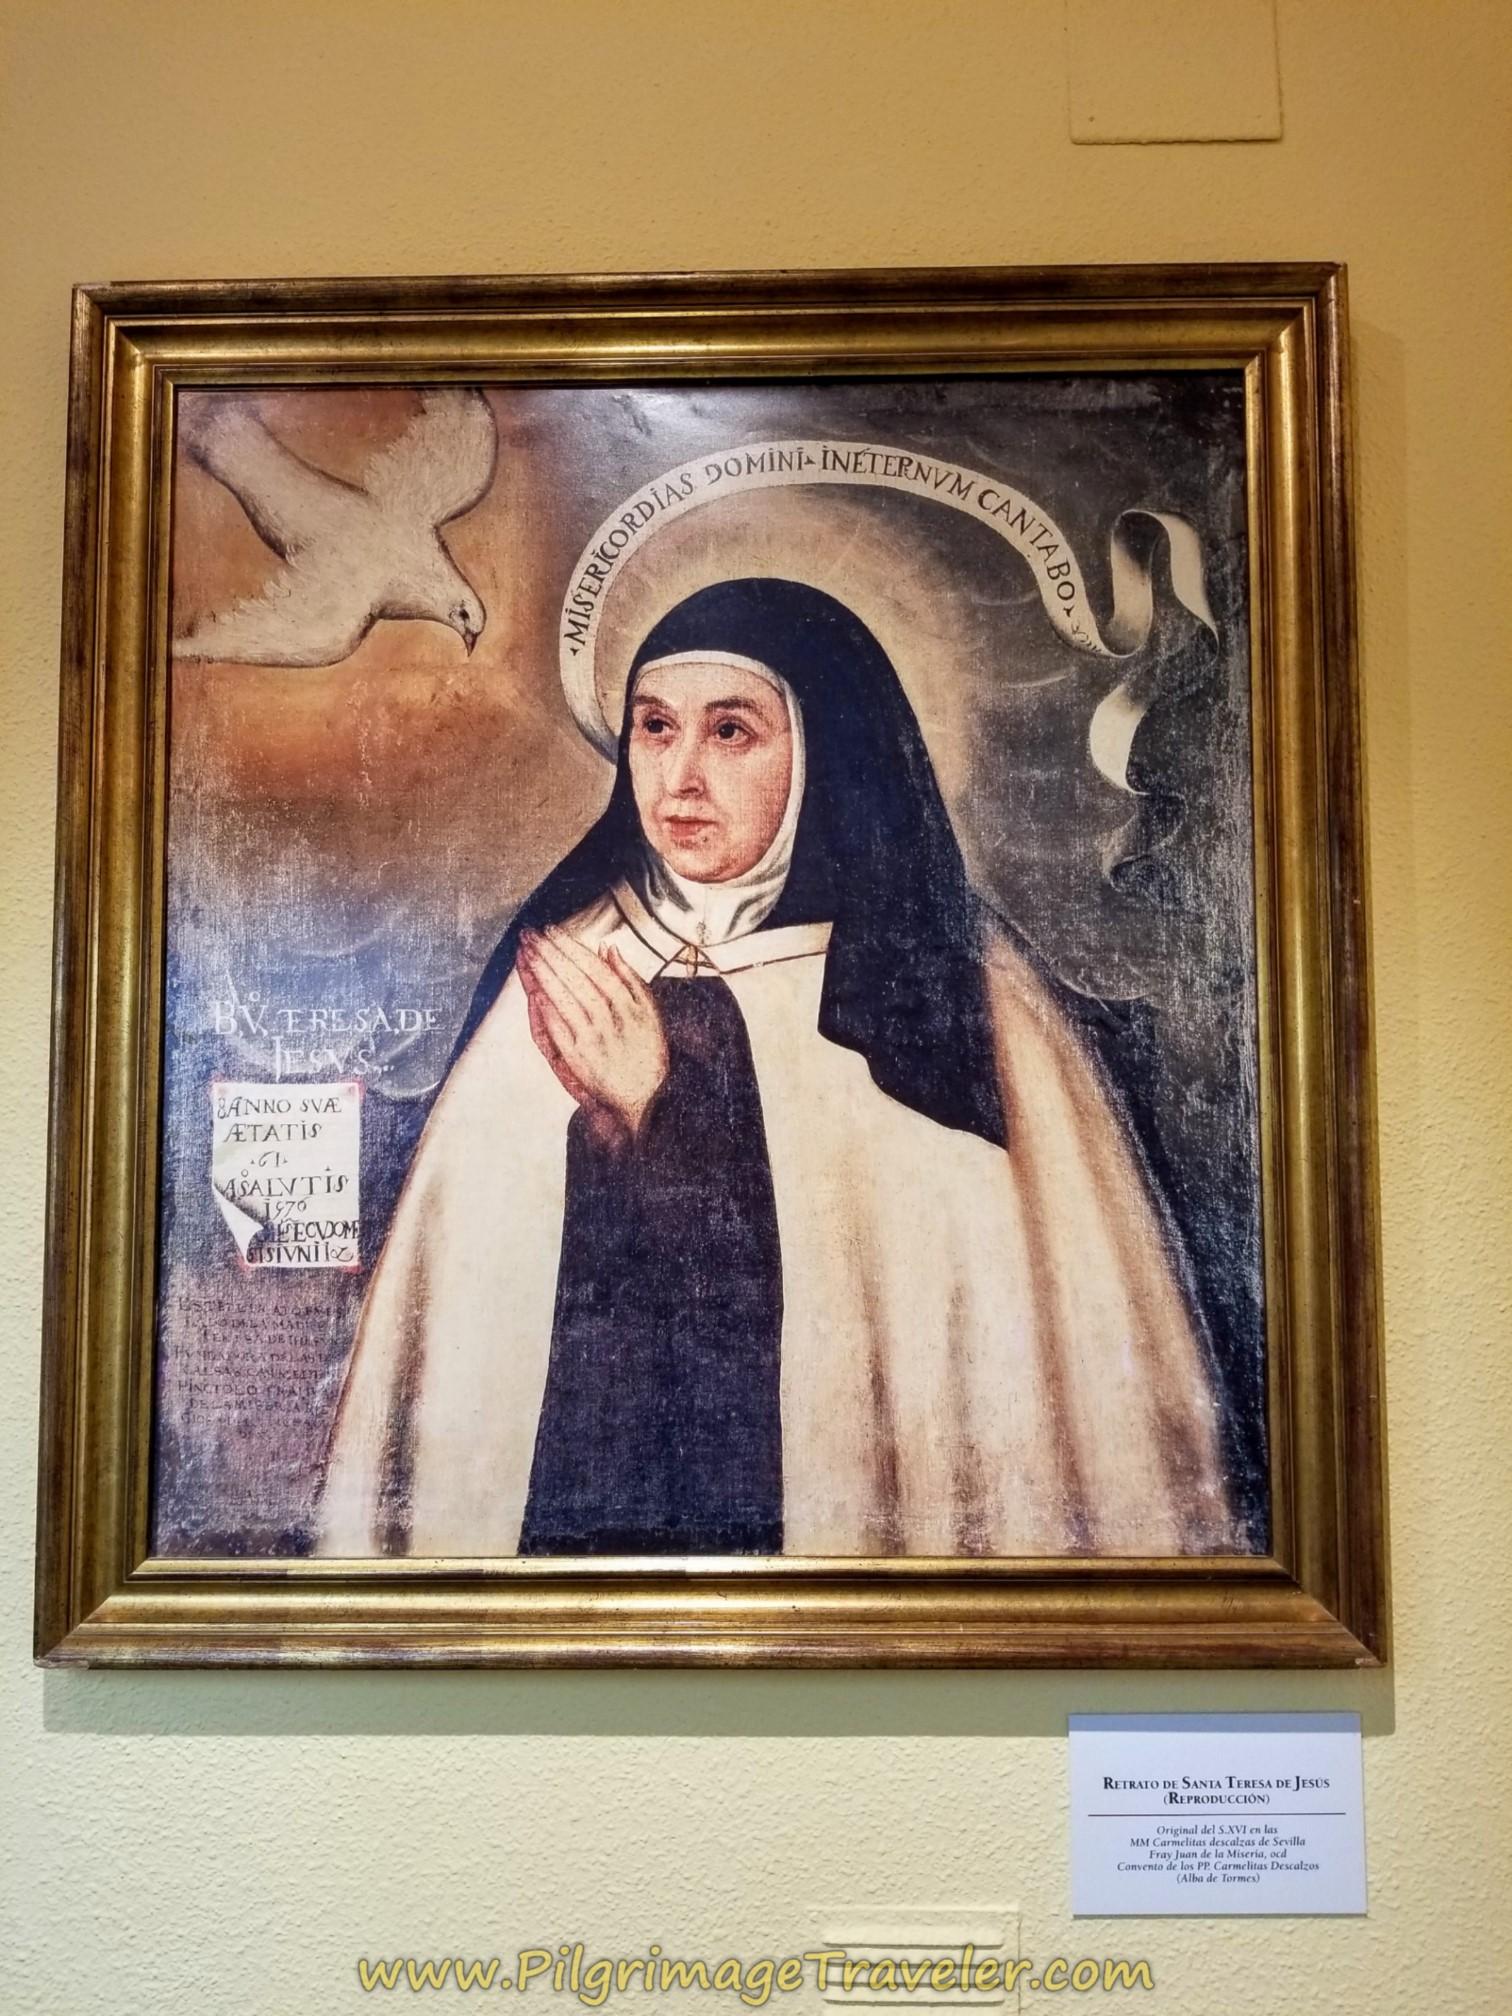 Reproduction of Famous St. Teresa Portrait, Centro Teresiano Sanjuanista, Alba de Tormes